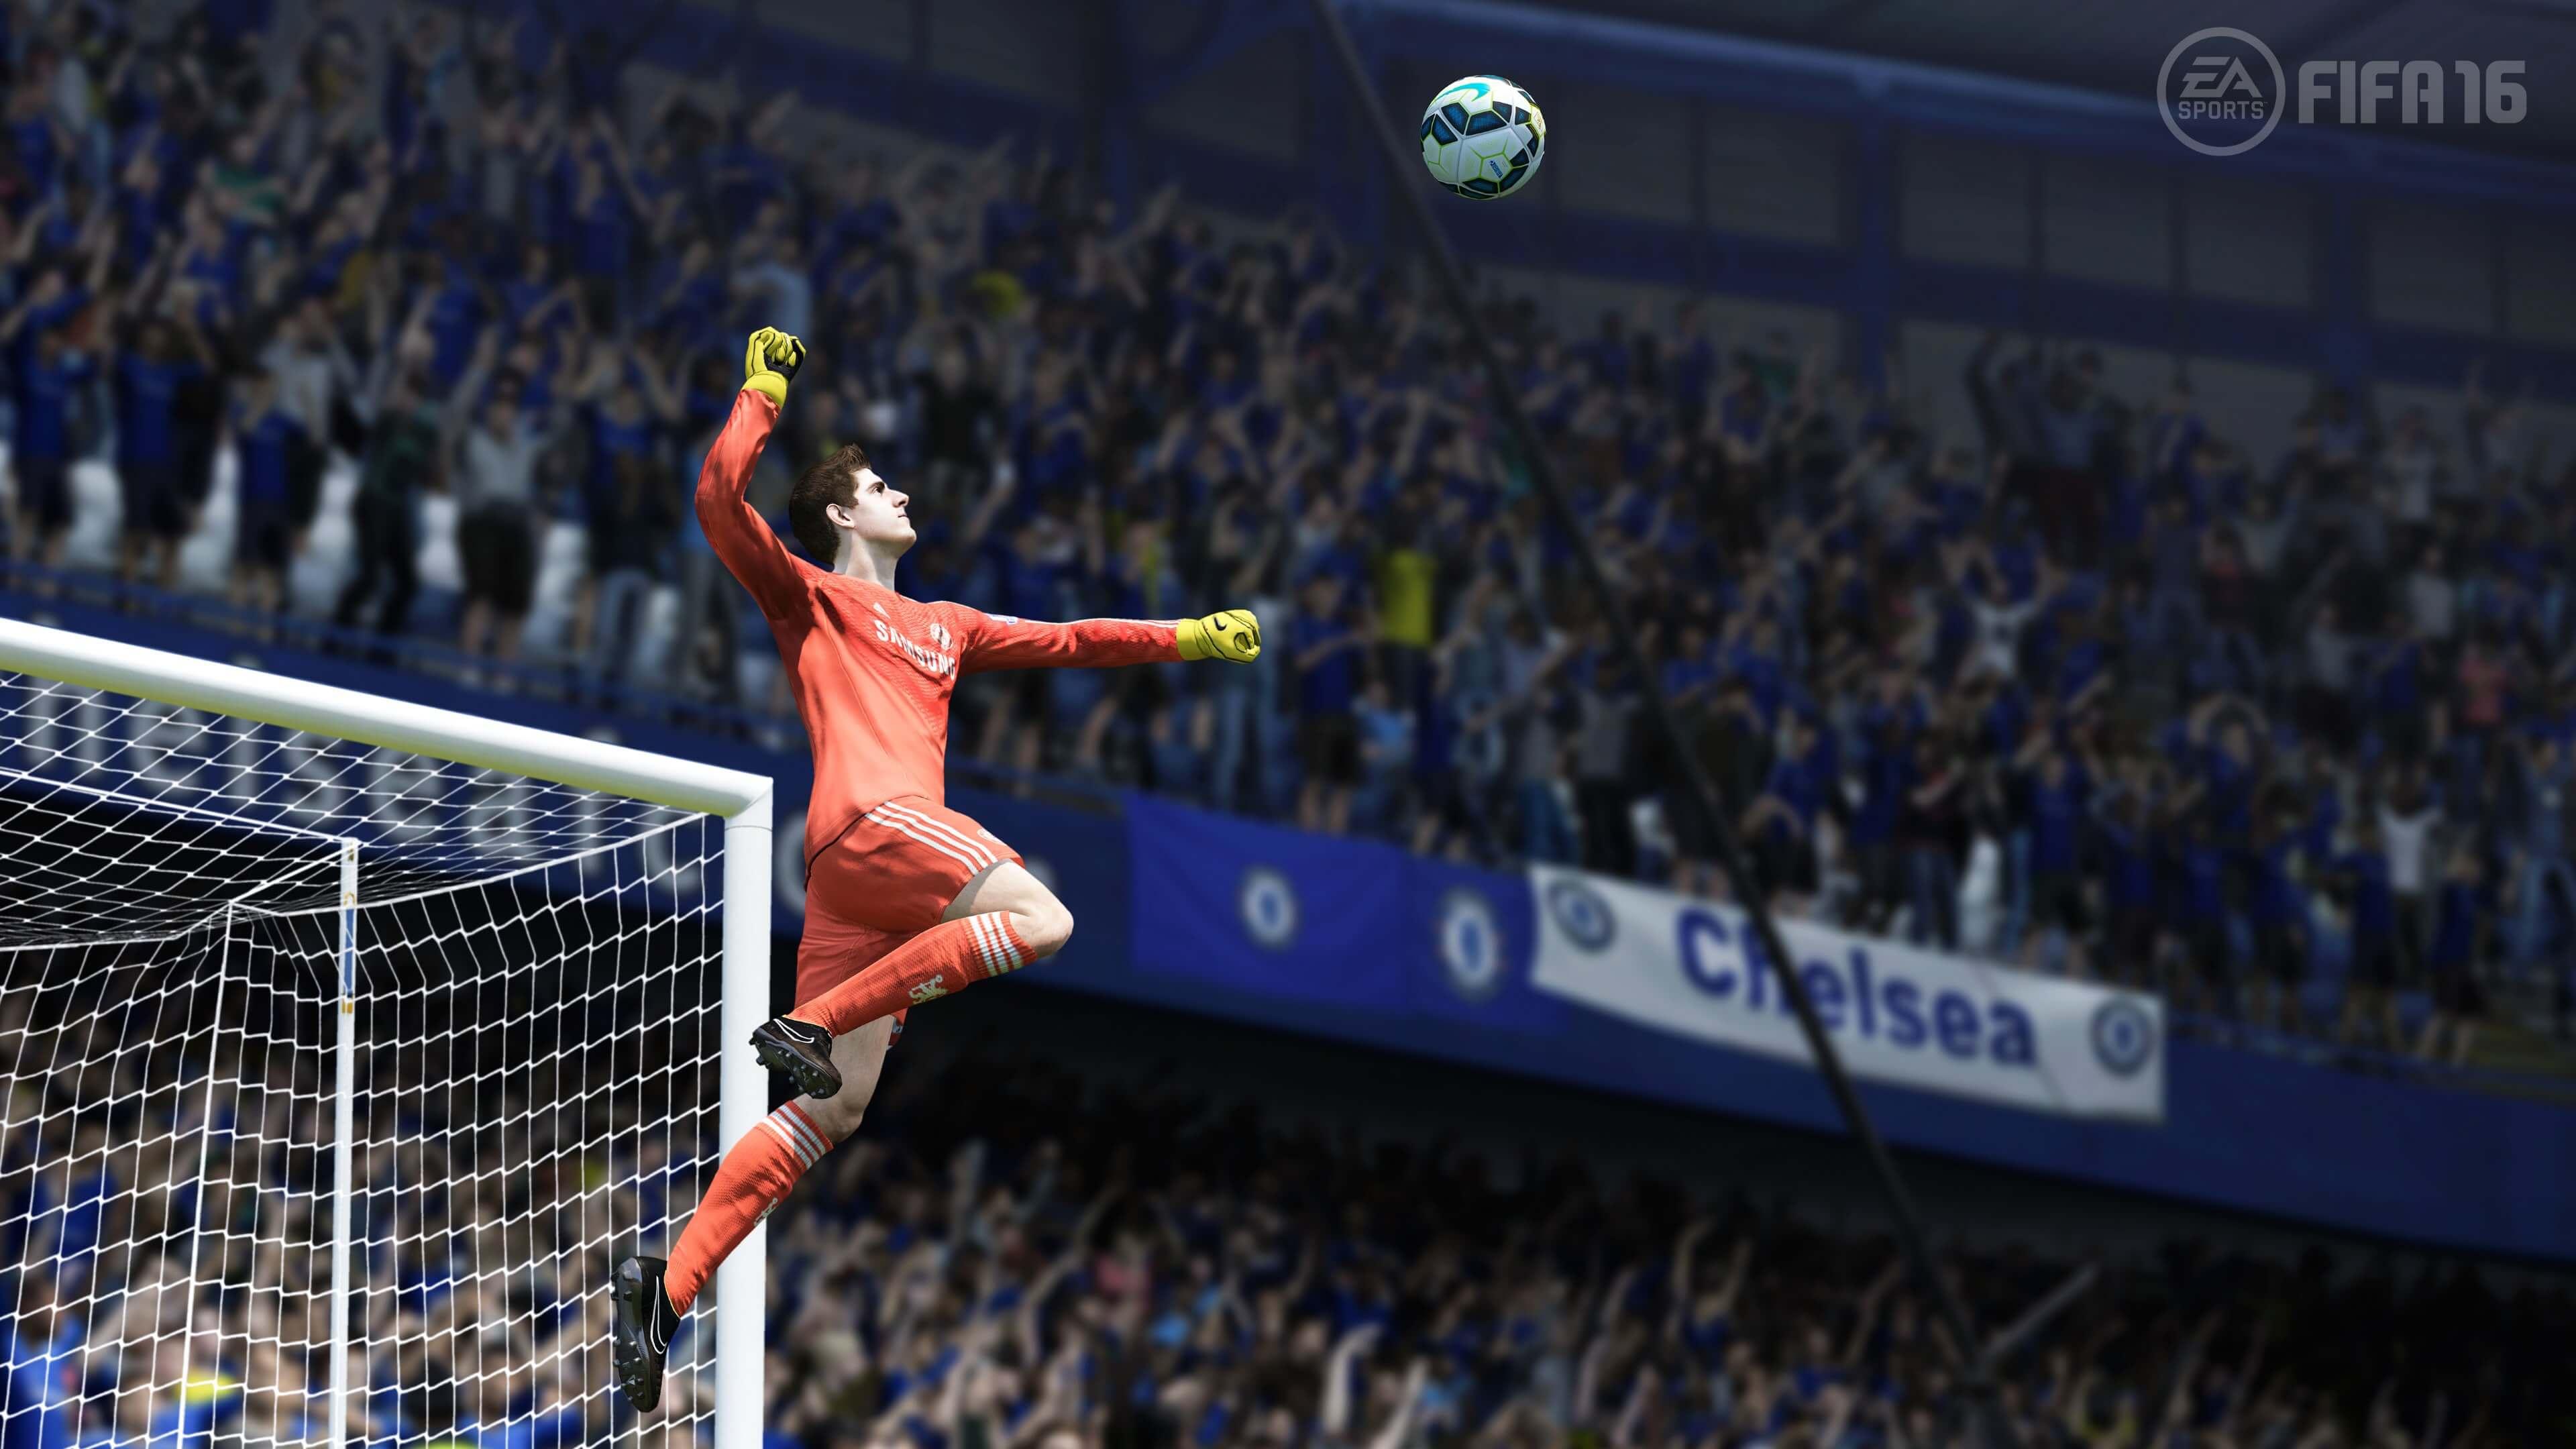 FIFA-16-Courtois